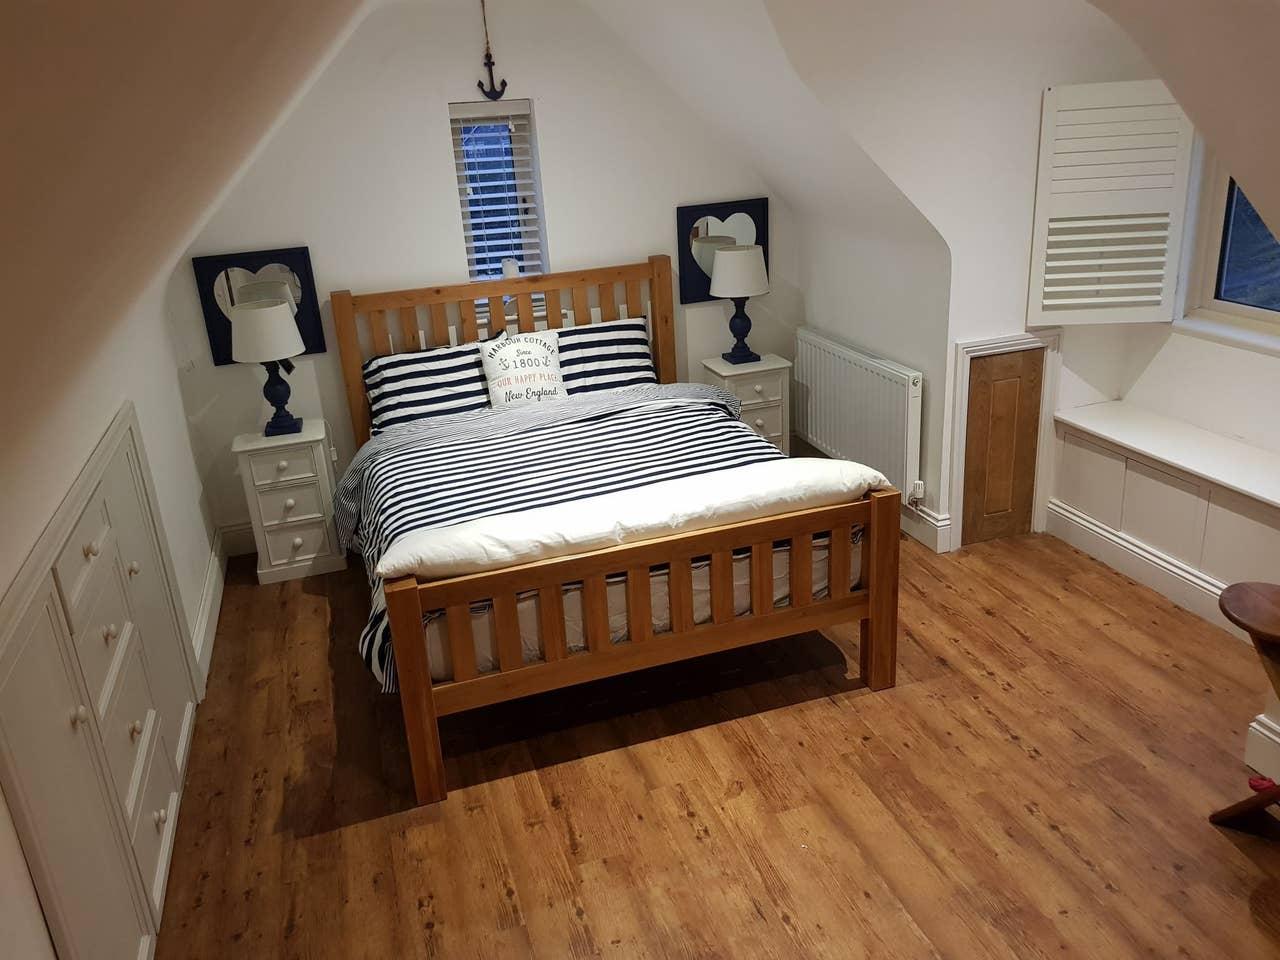 Cheap Airbnb Rentals Manchester